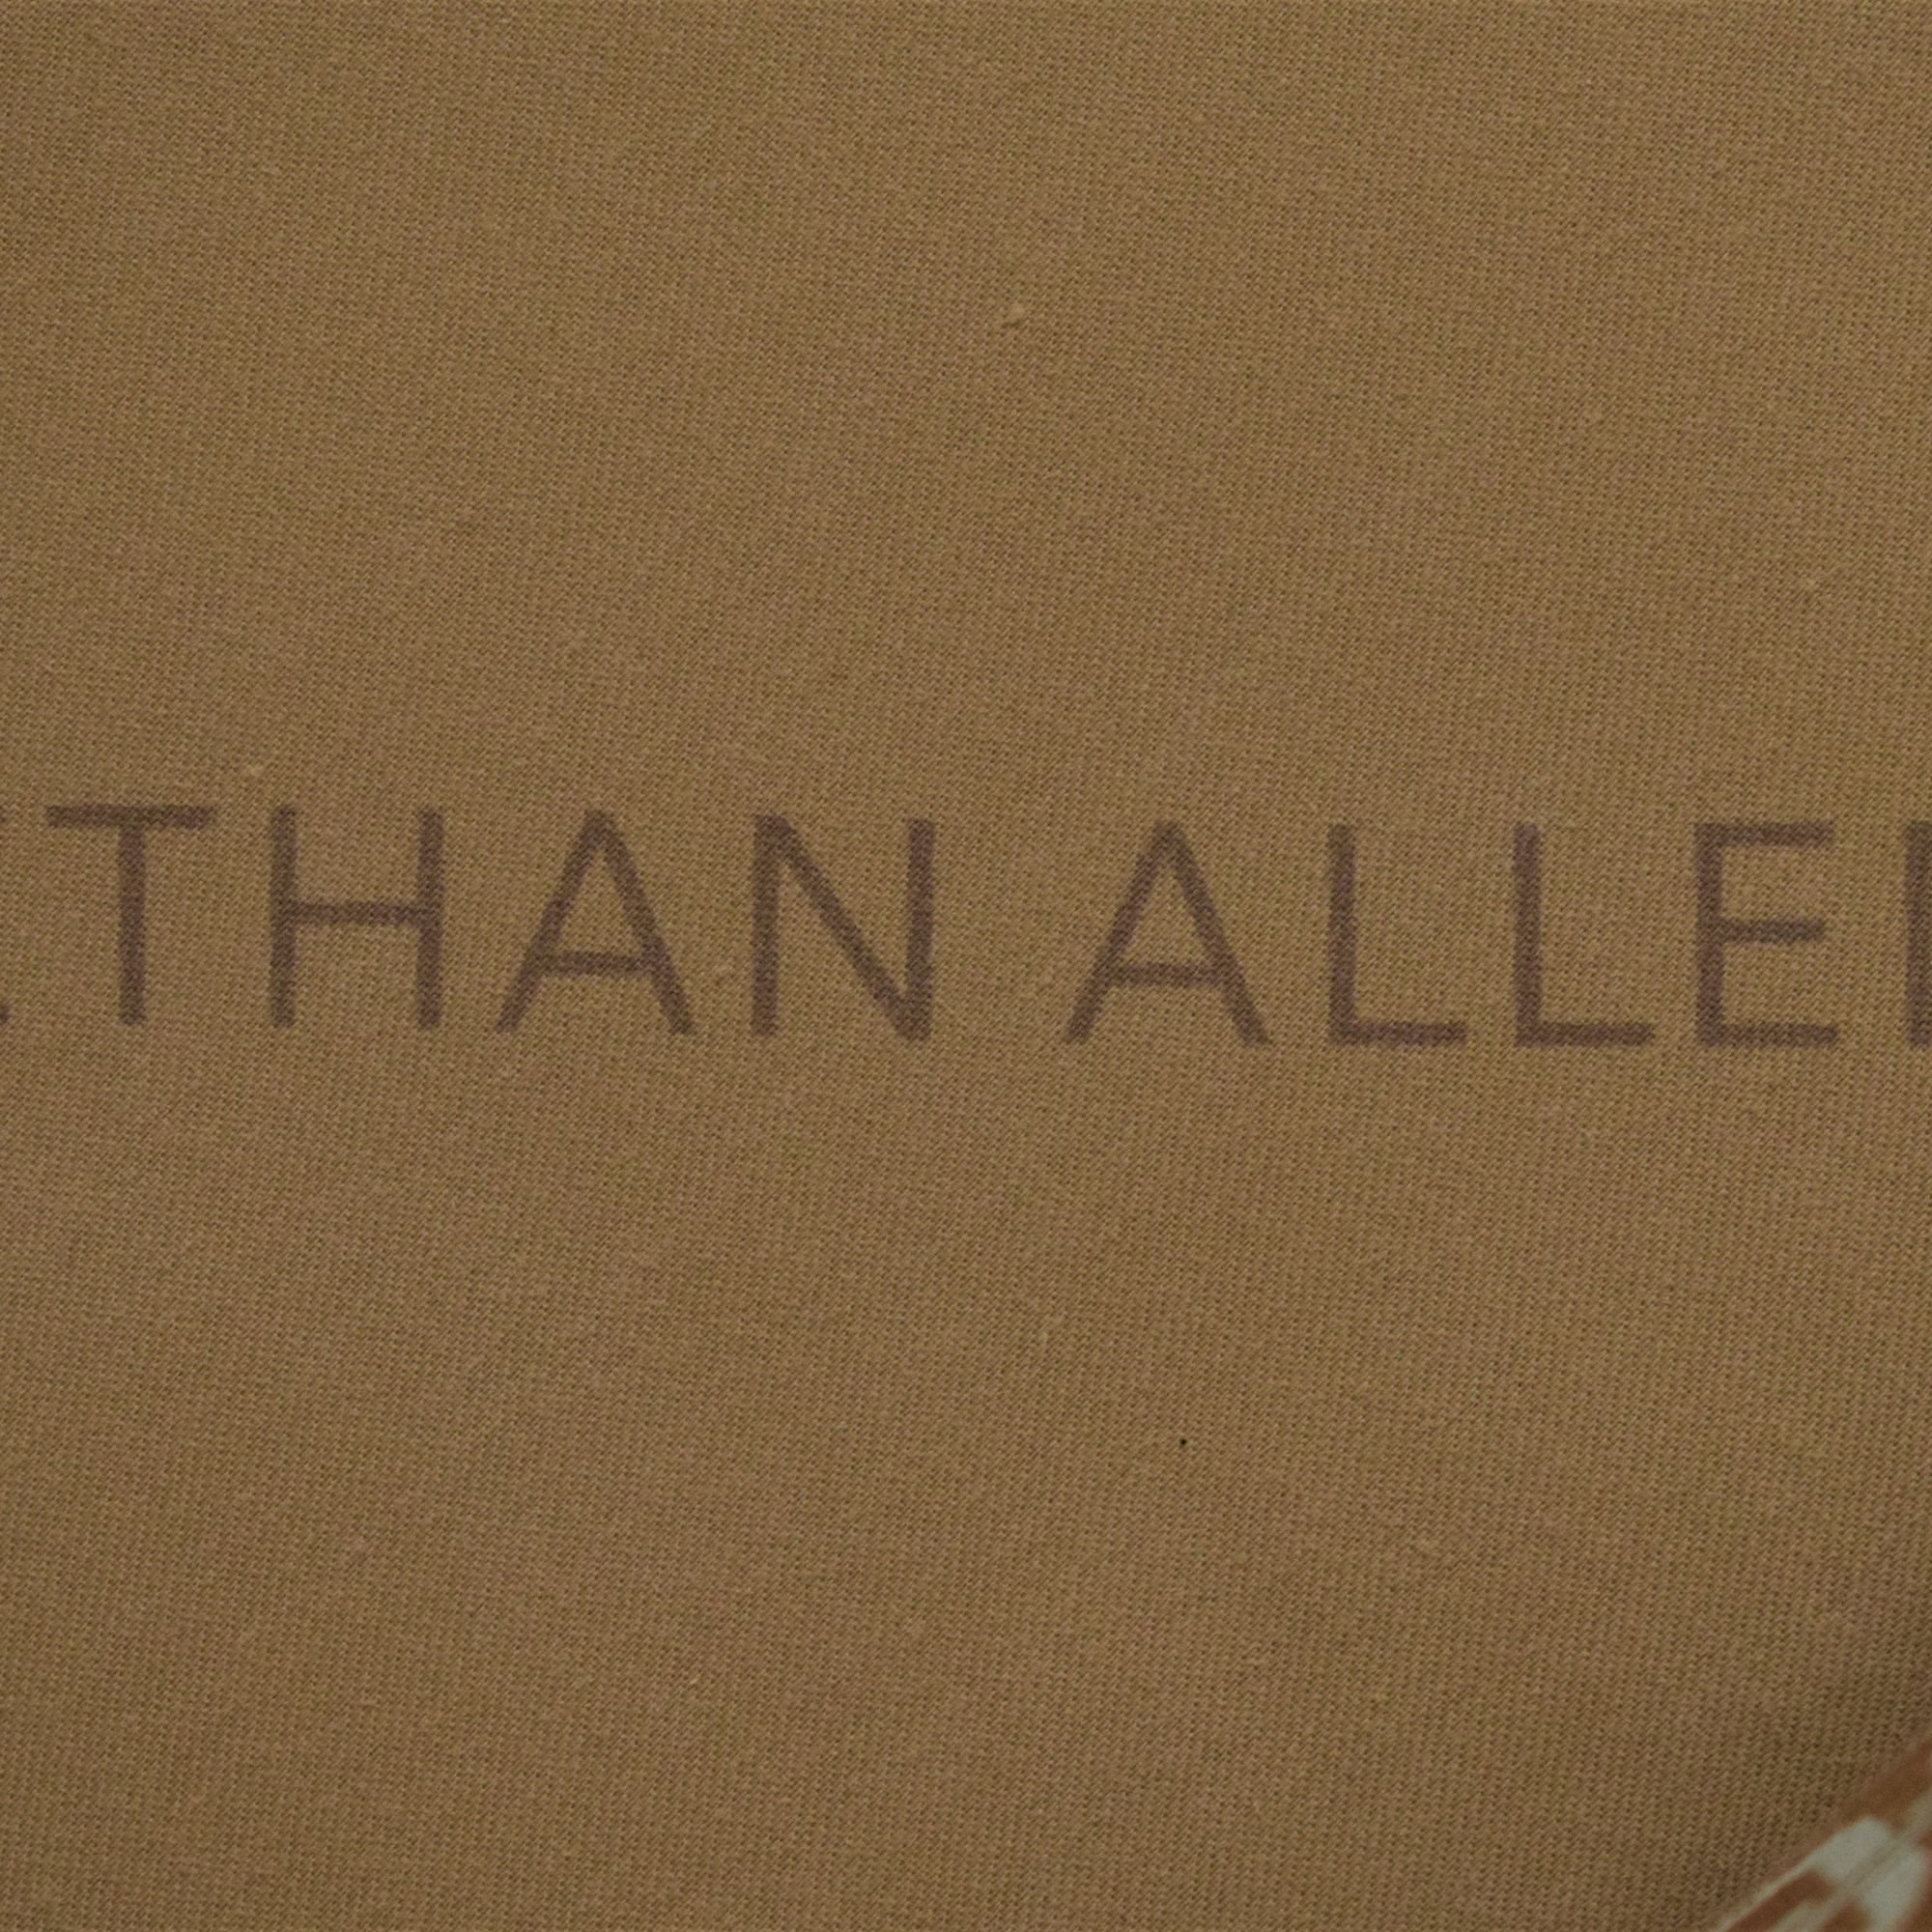 Ethan Allen Custom Collin Chair / Accent Chairs